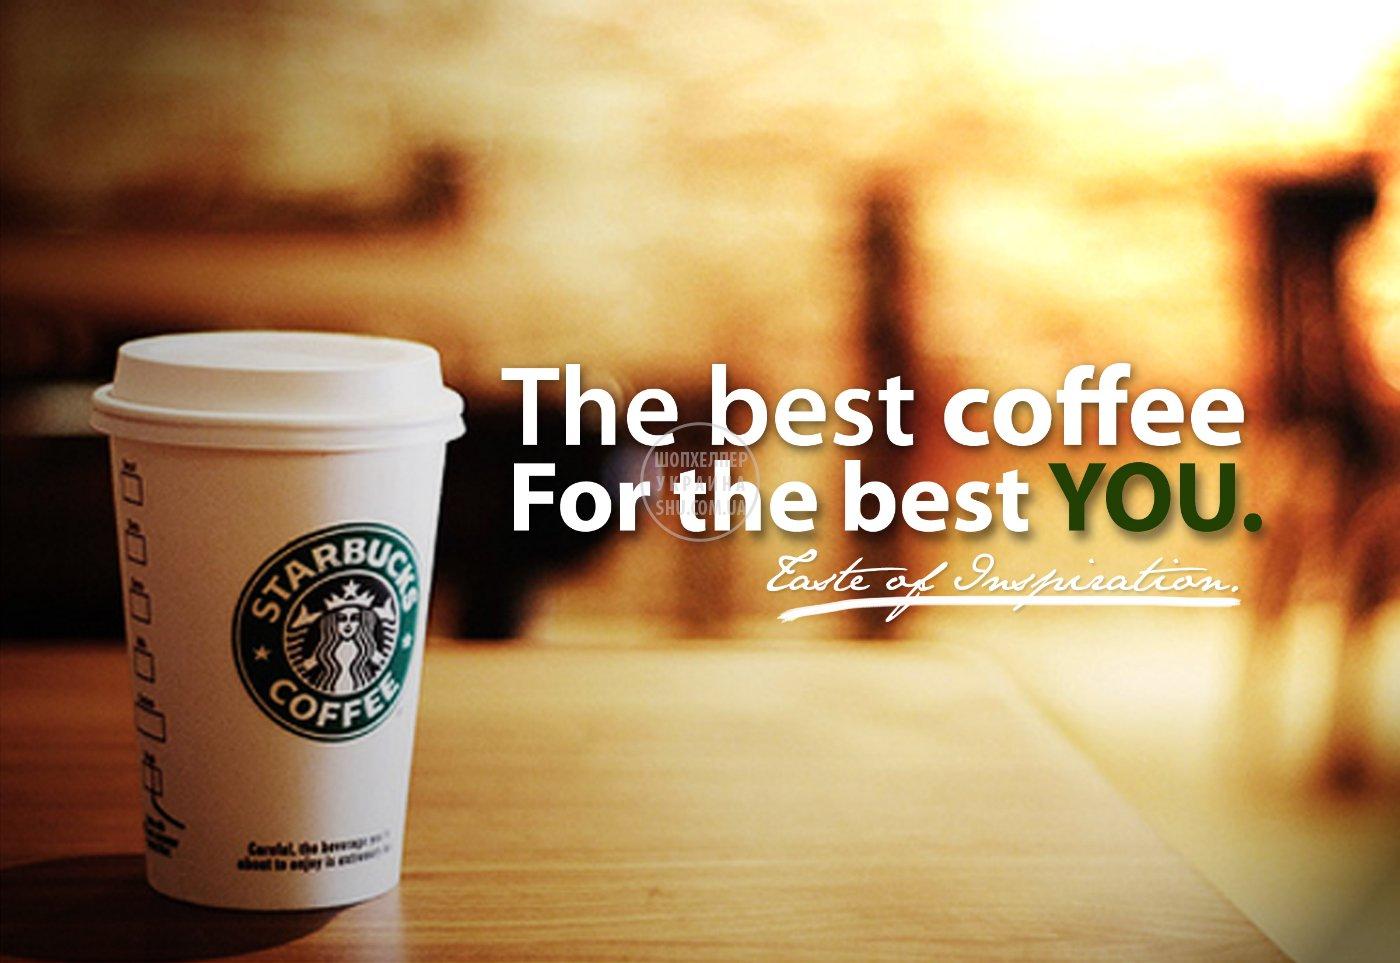 starbucks_coffee_sustaining_ad_by_eathan28.jpg